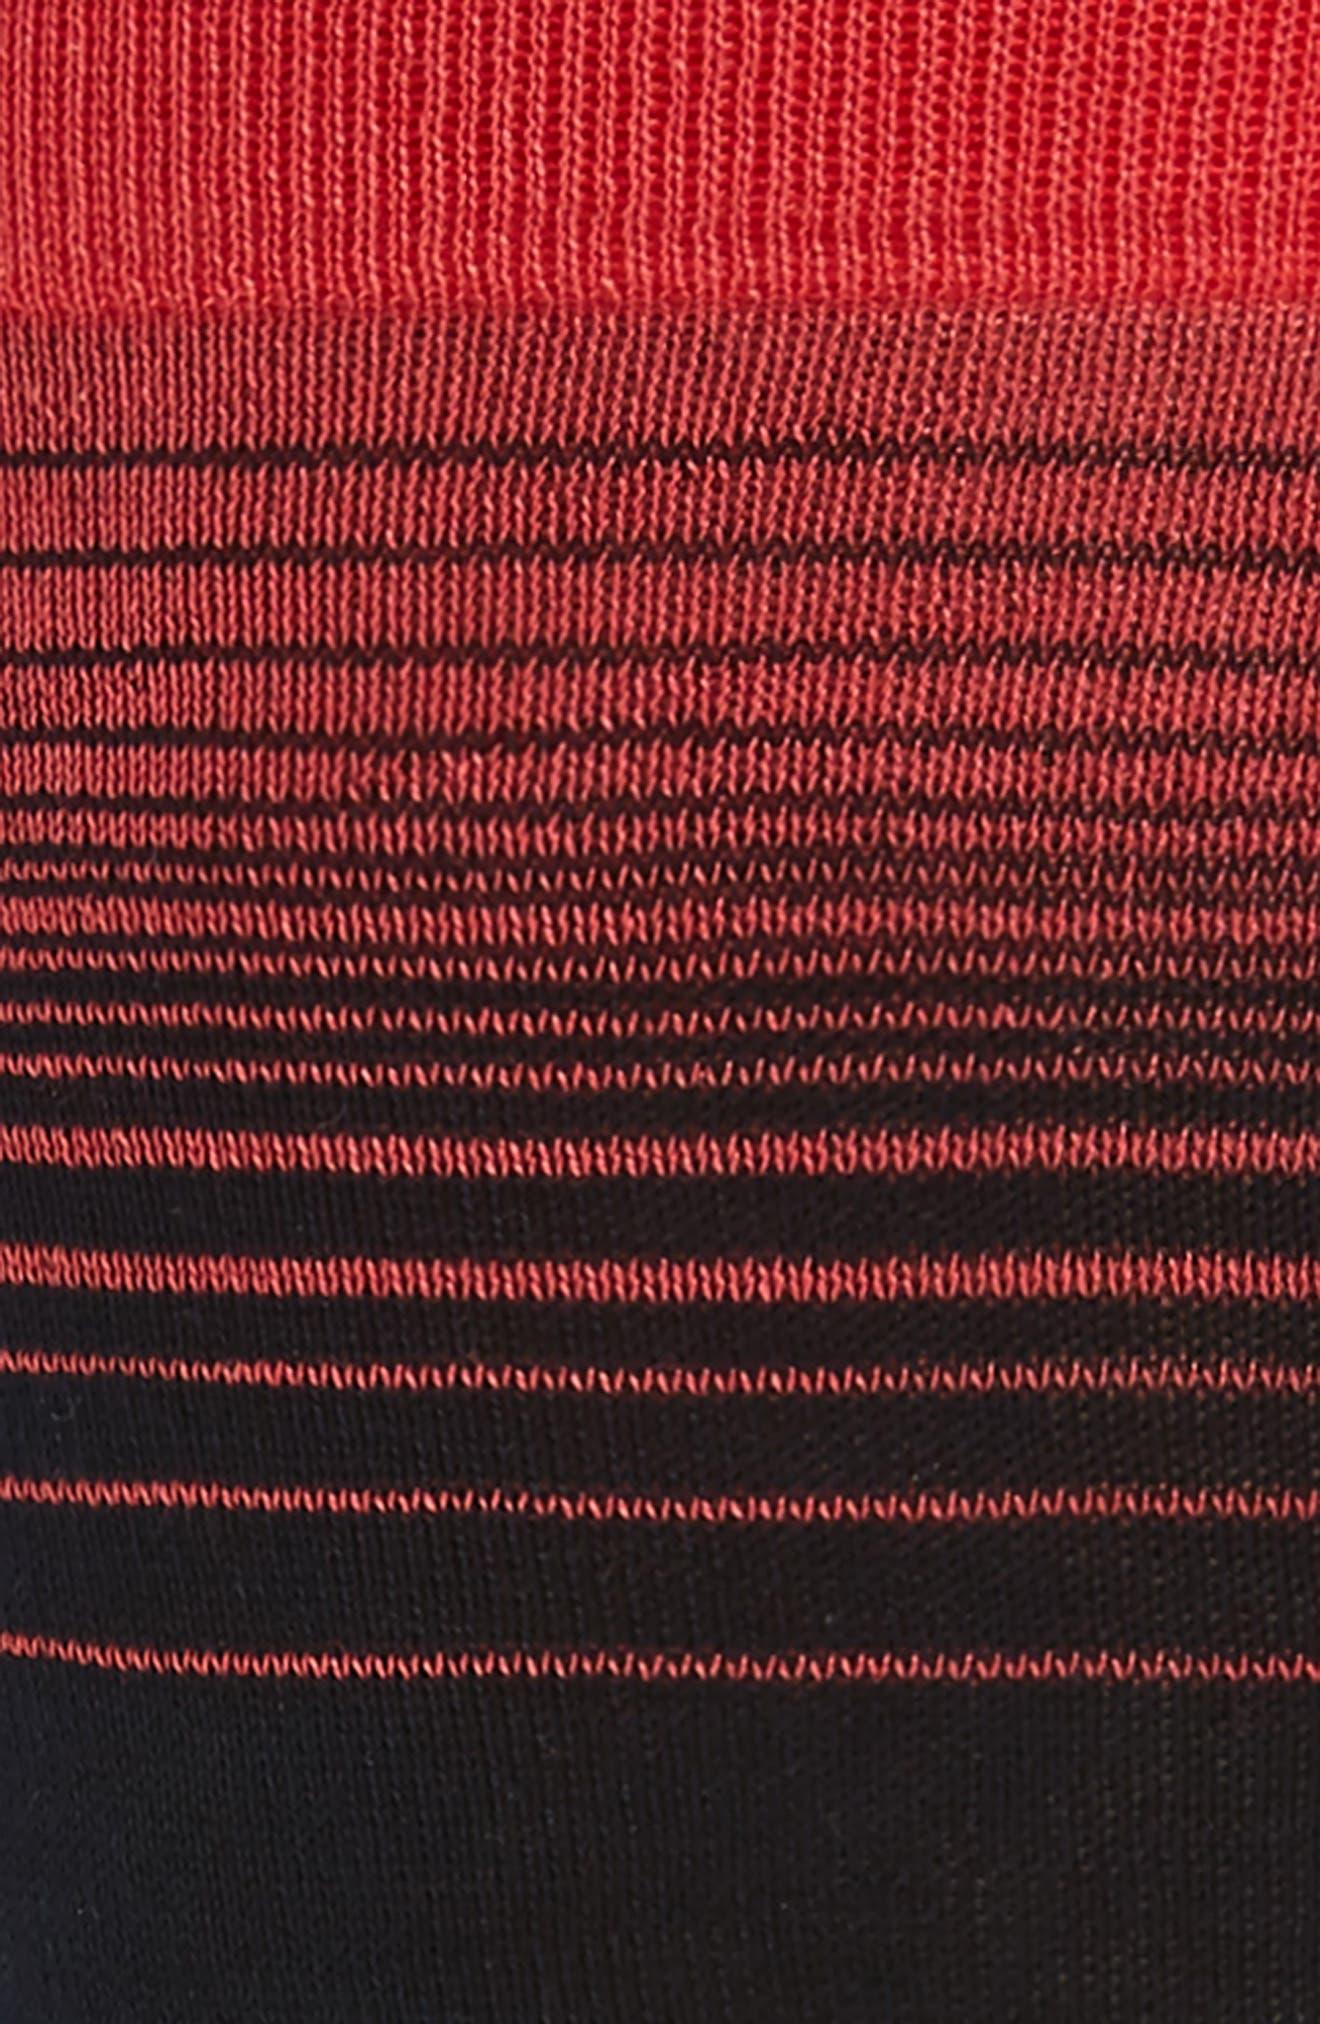 Stripe Socks,                             Alternate thumbnail 2, color,                             005